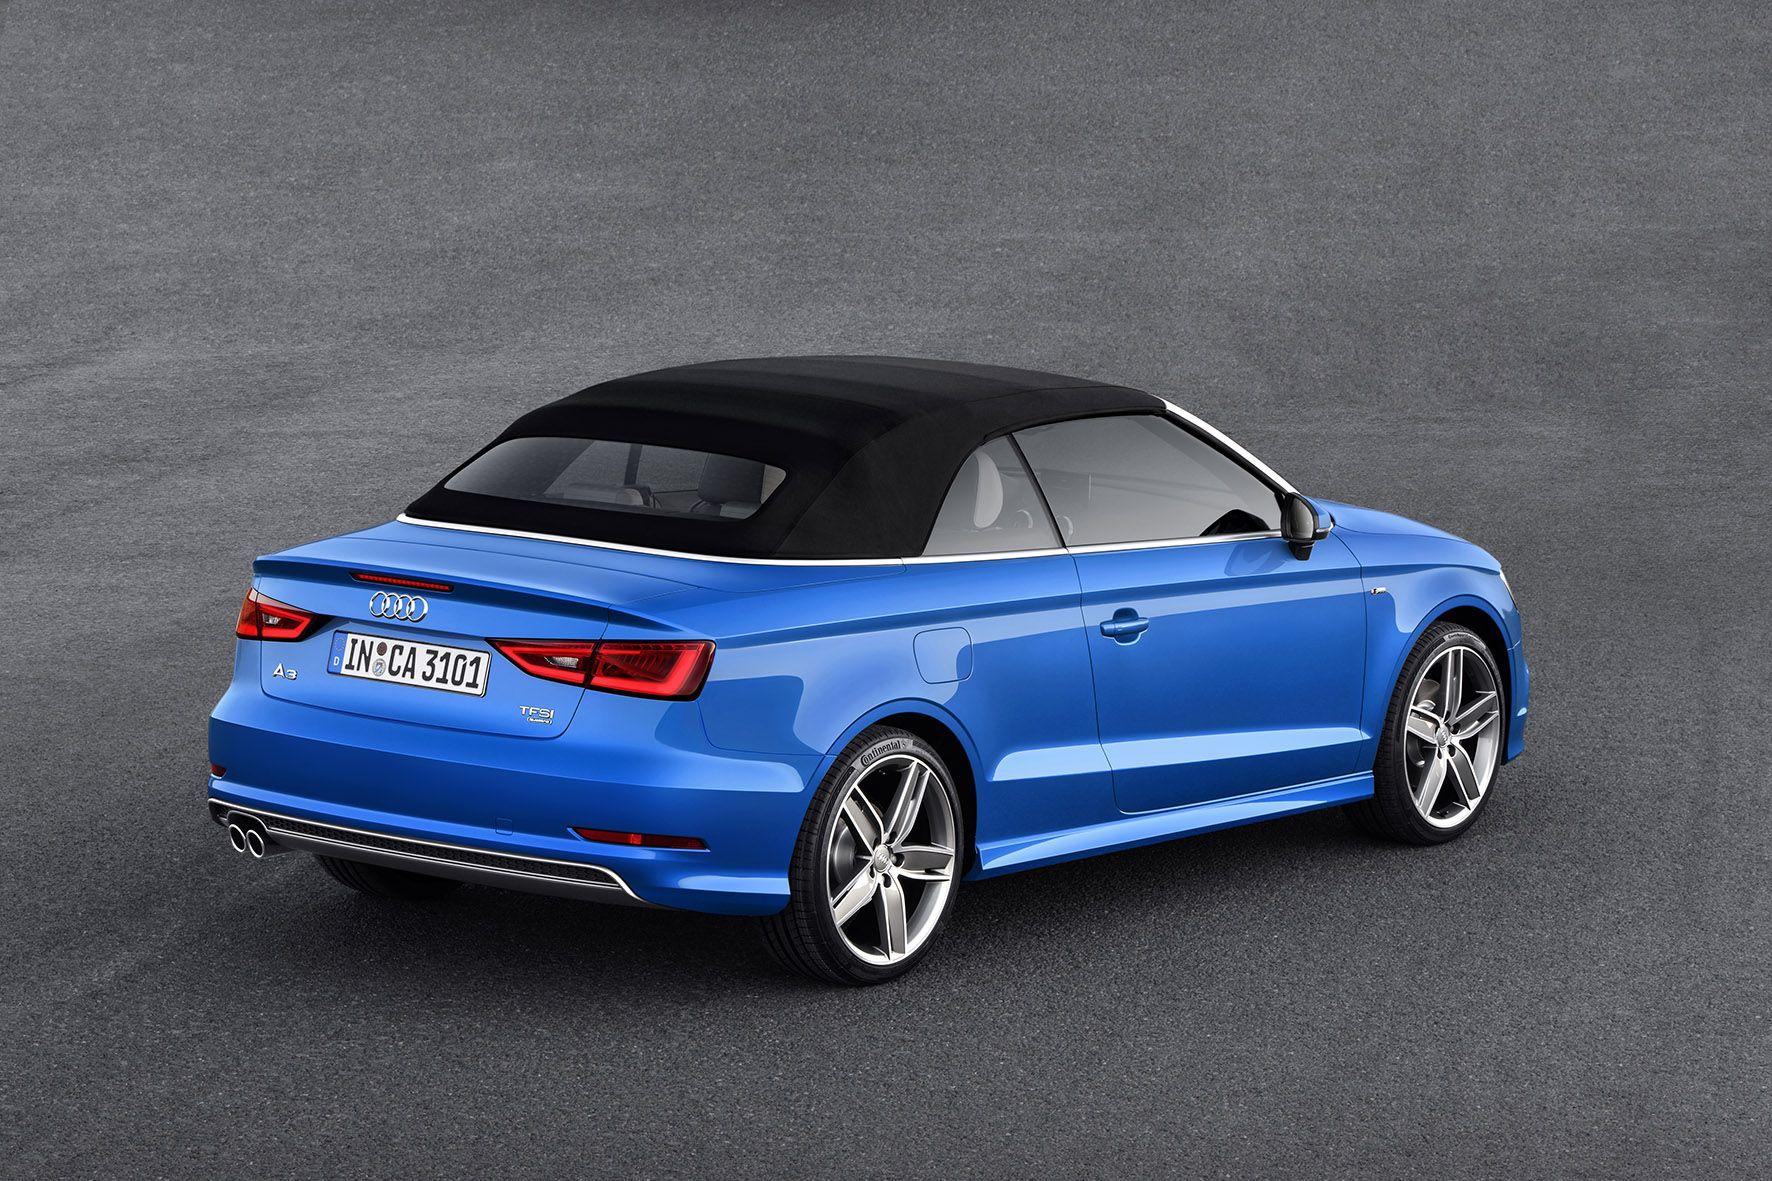 Alvast Voor De Zomer Prijzen Van De Audi A3 Cabriolet Drivessential Audi A3 Audi Cabriolet